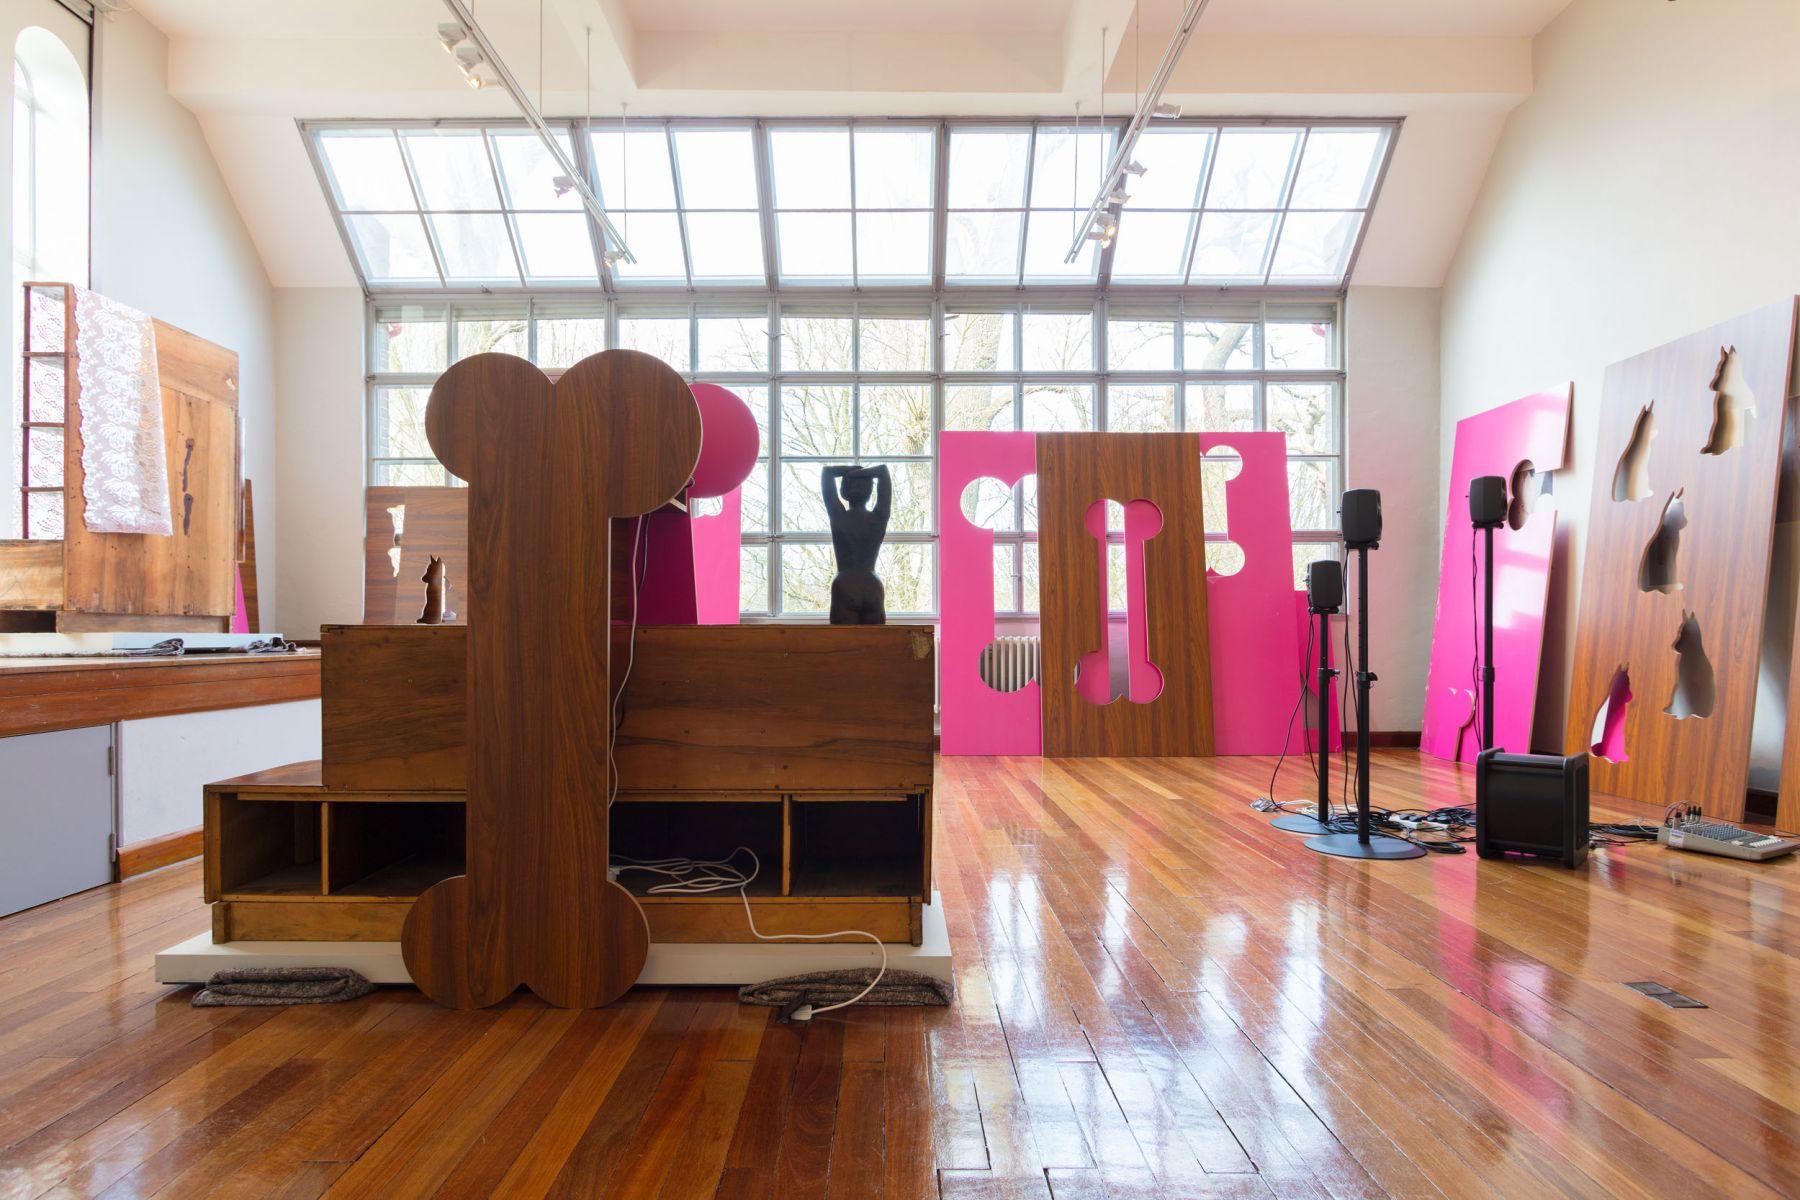 Hilary Lloyd, Installation view, Awful Girls, Dorich House Museum, Kingston University, London